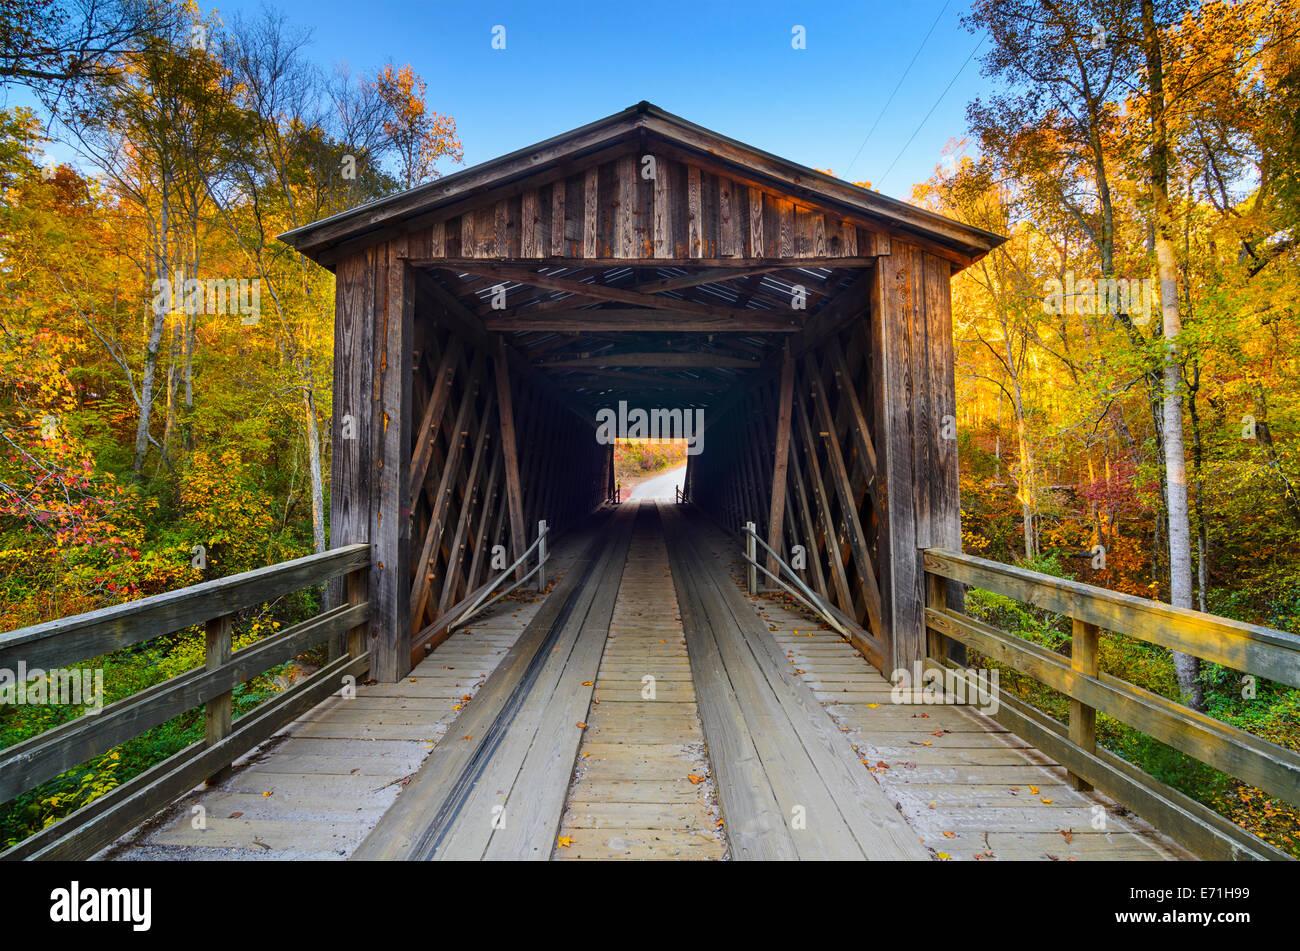 Elder's covered bridge in the fall season in Oconee, Georgia, USA. - Stock Image